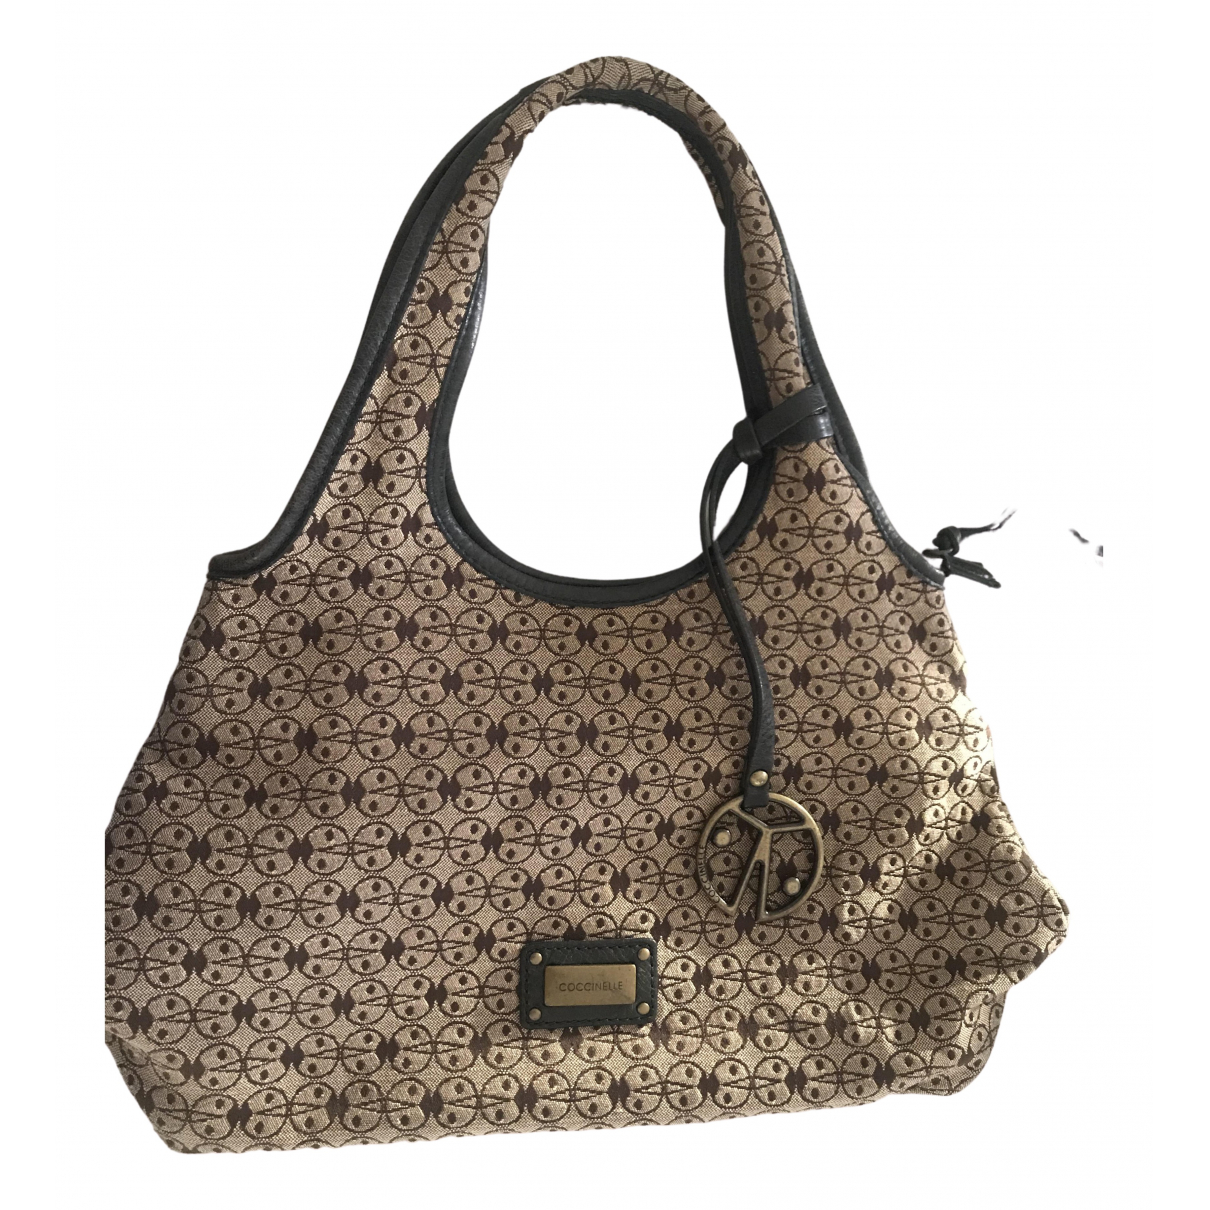 Coccinelle \N Cloth handbag for Women \N